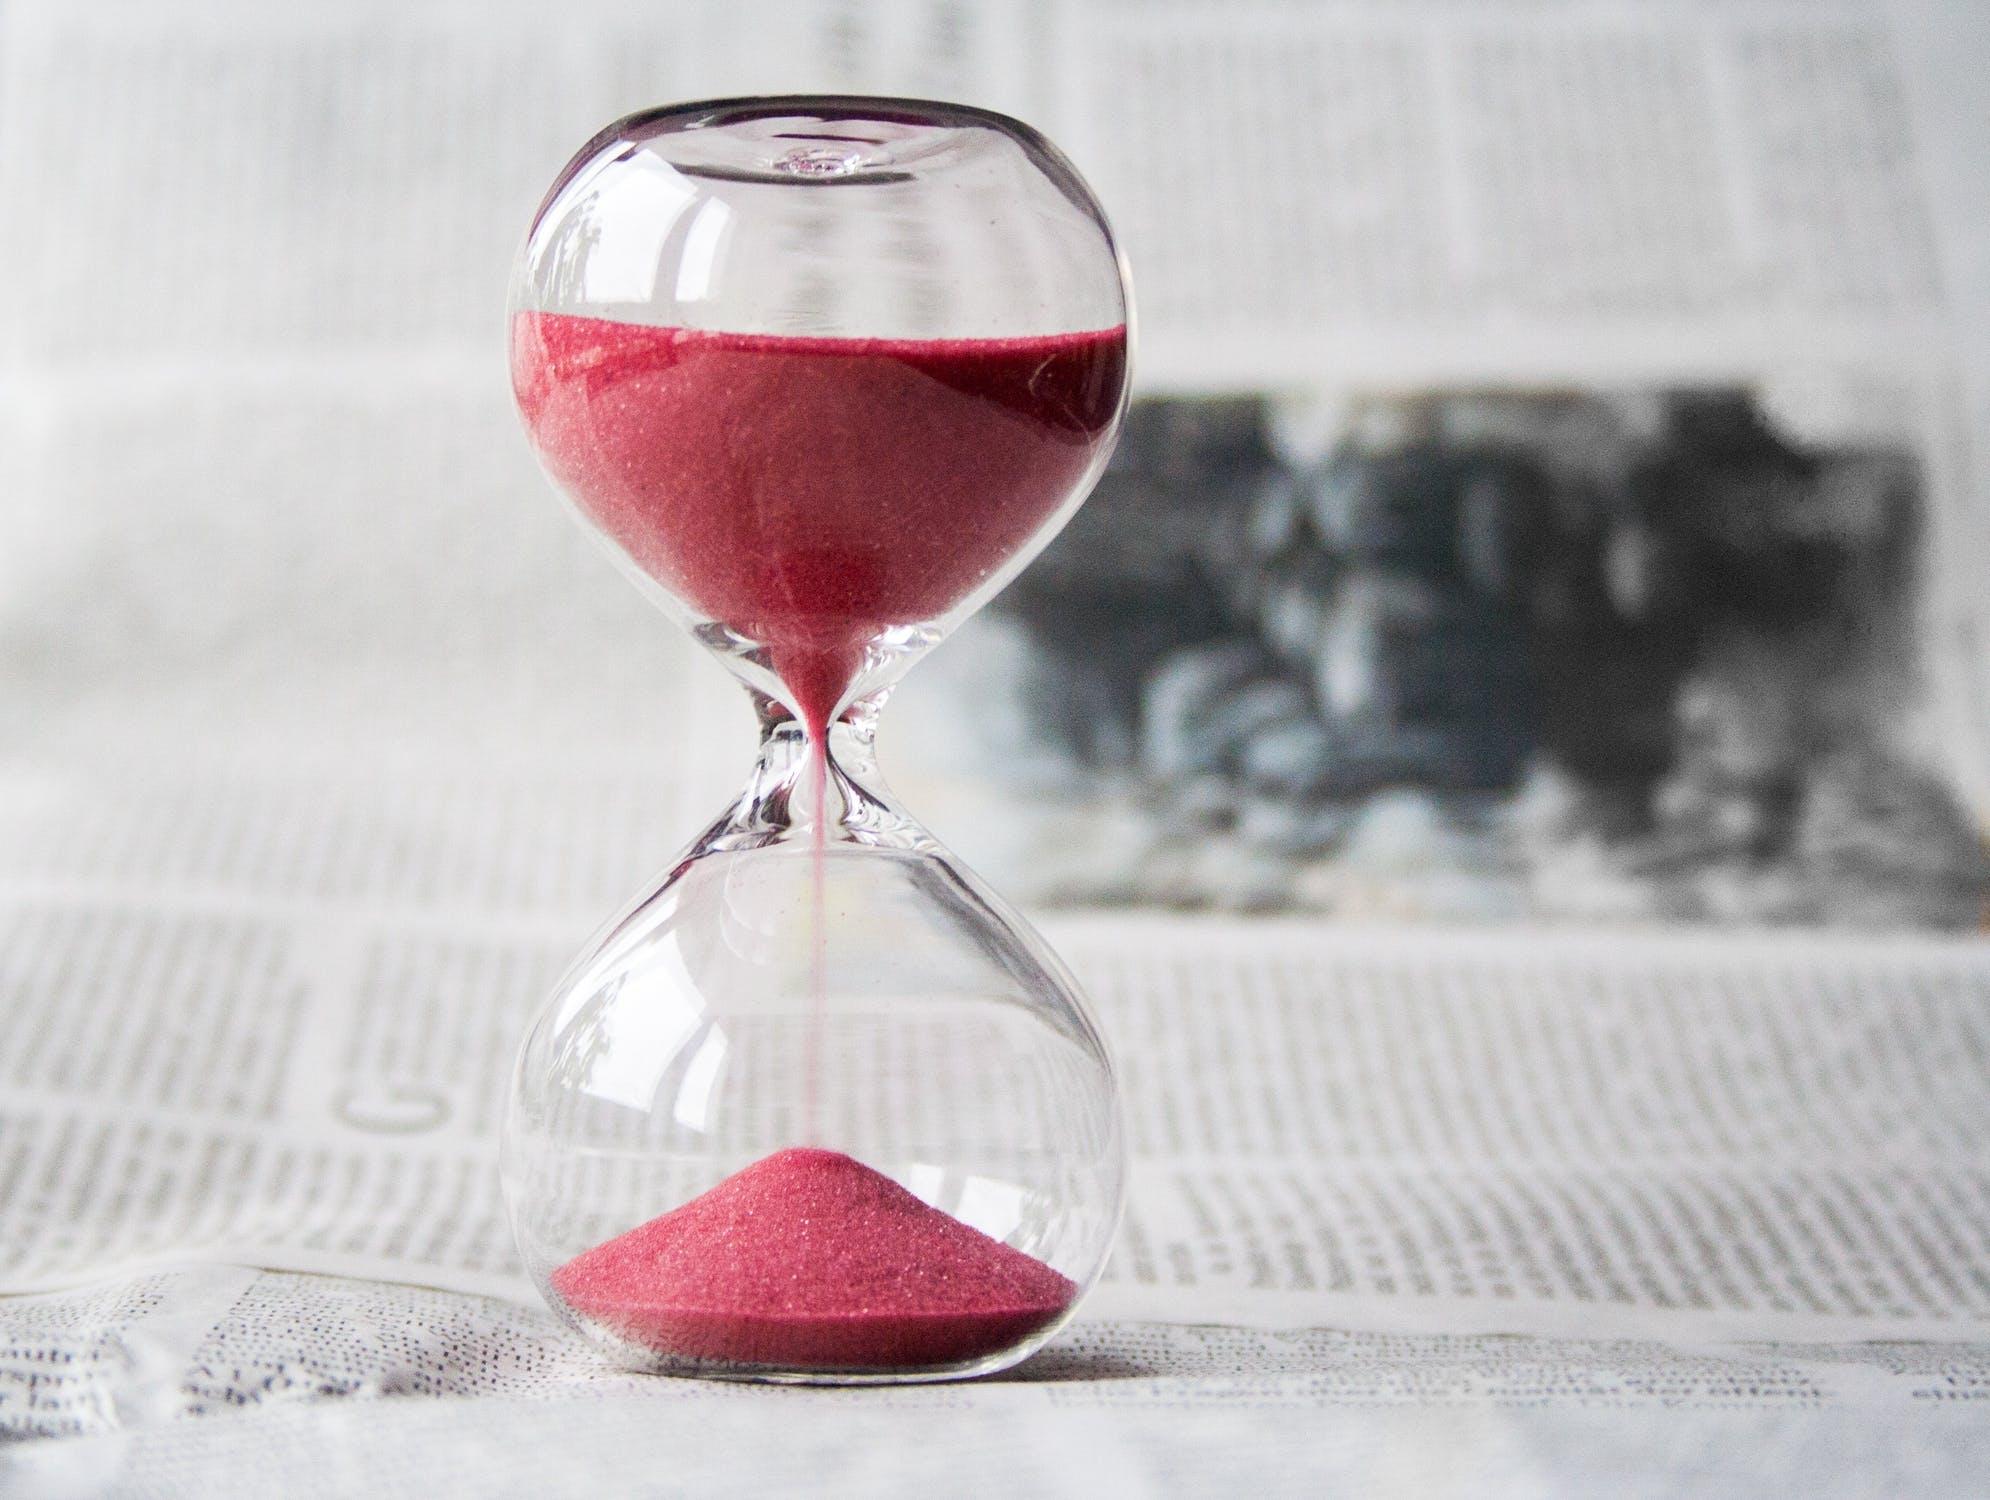 ef535374 hourglass time hours sand 39396